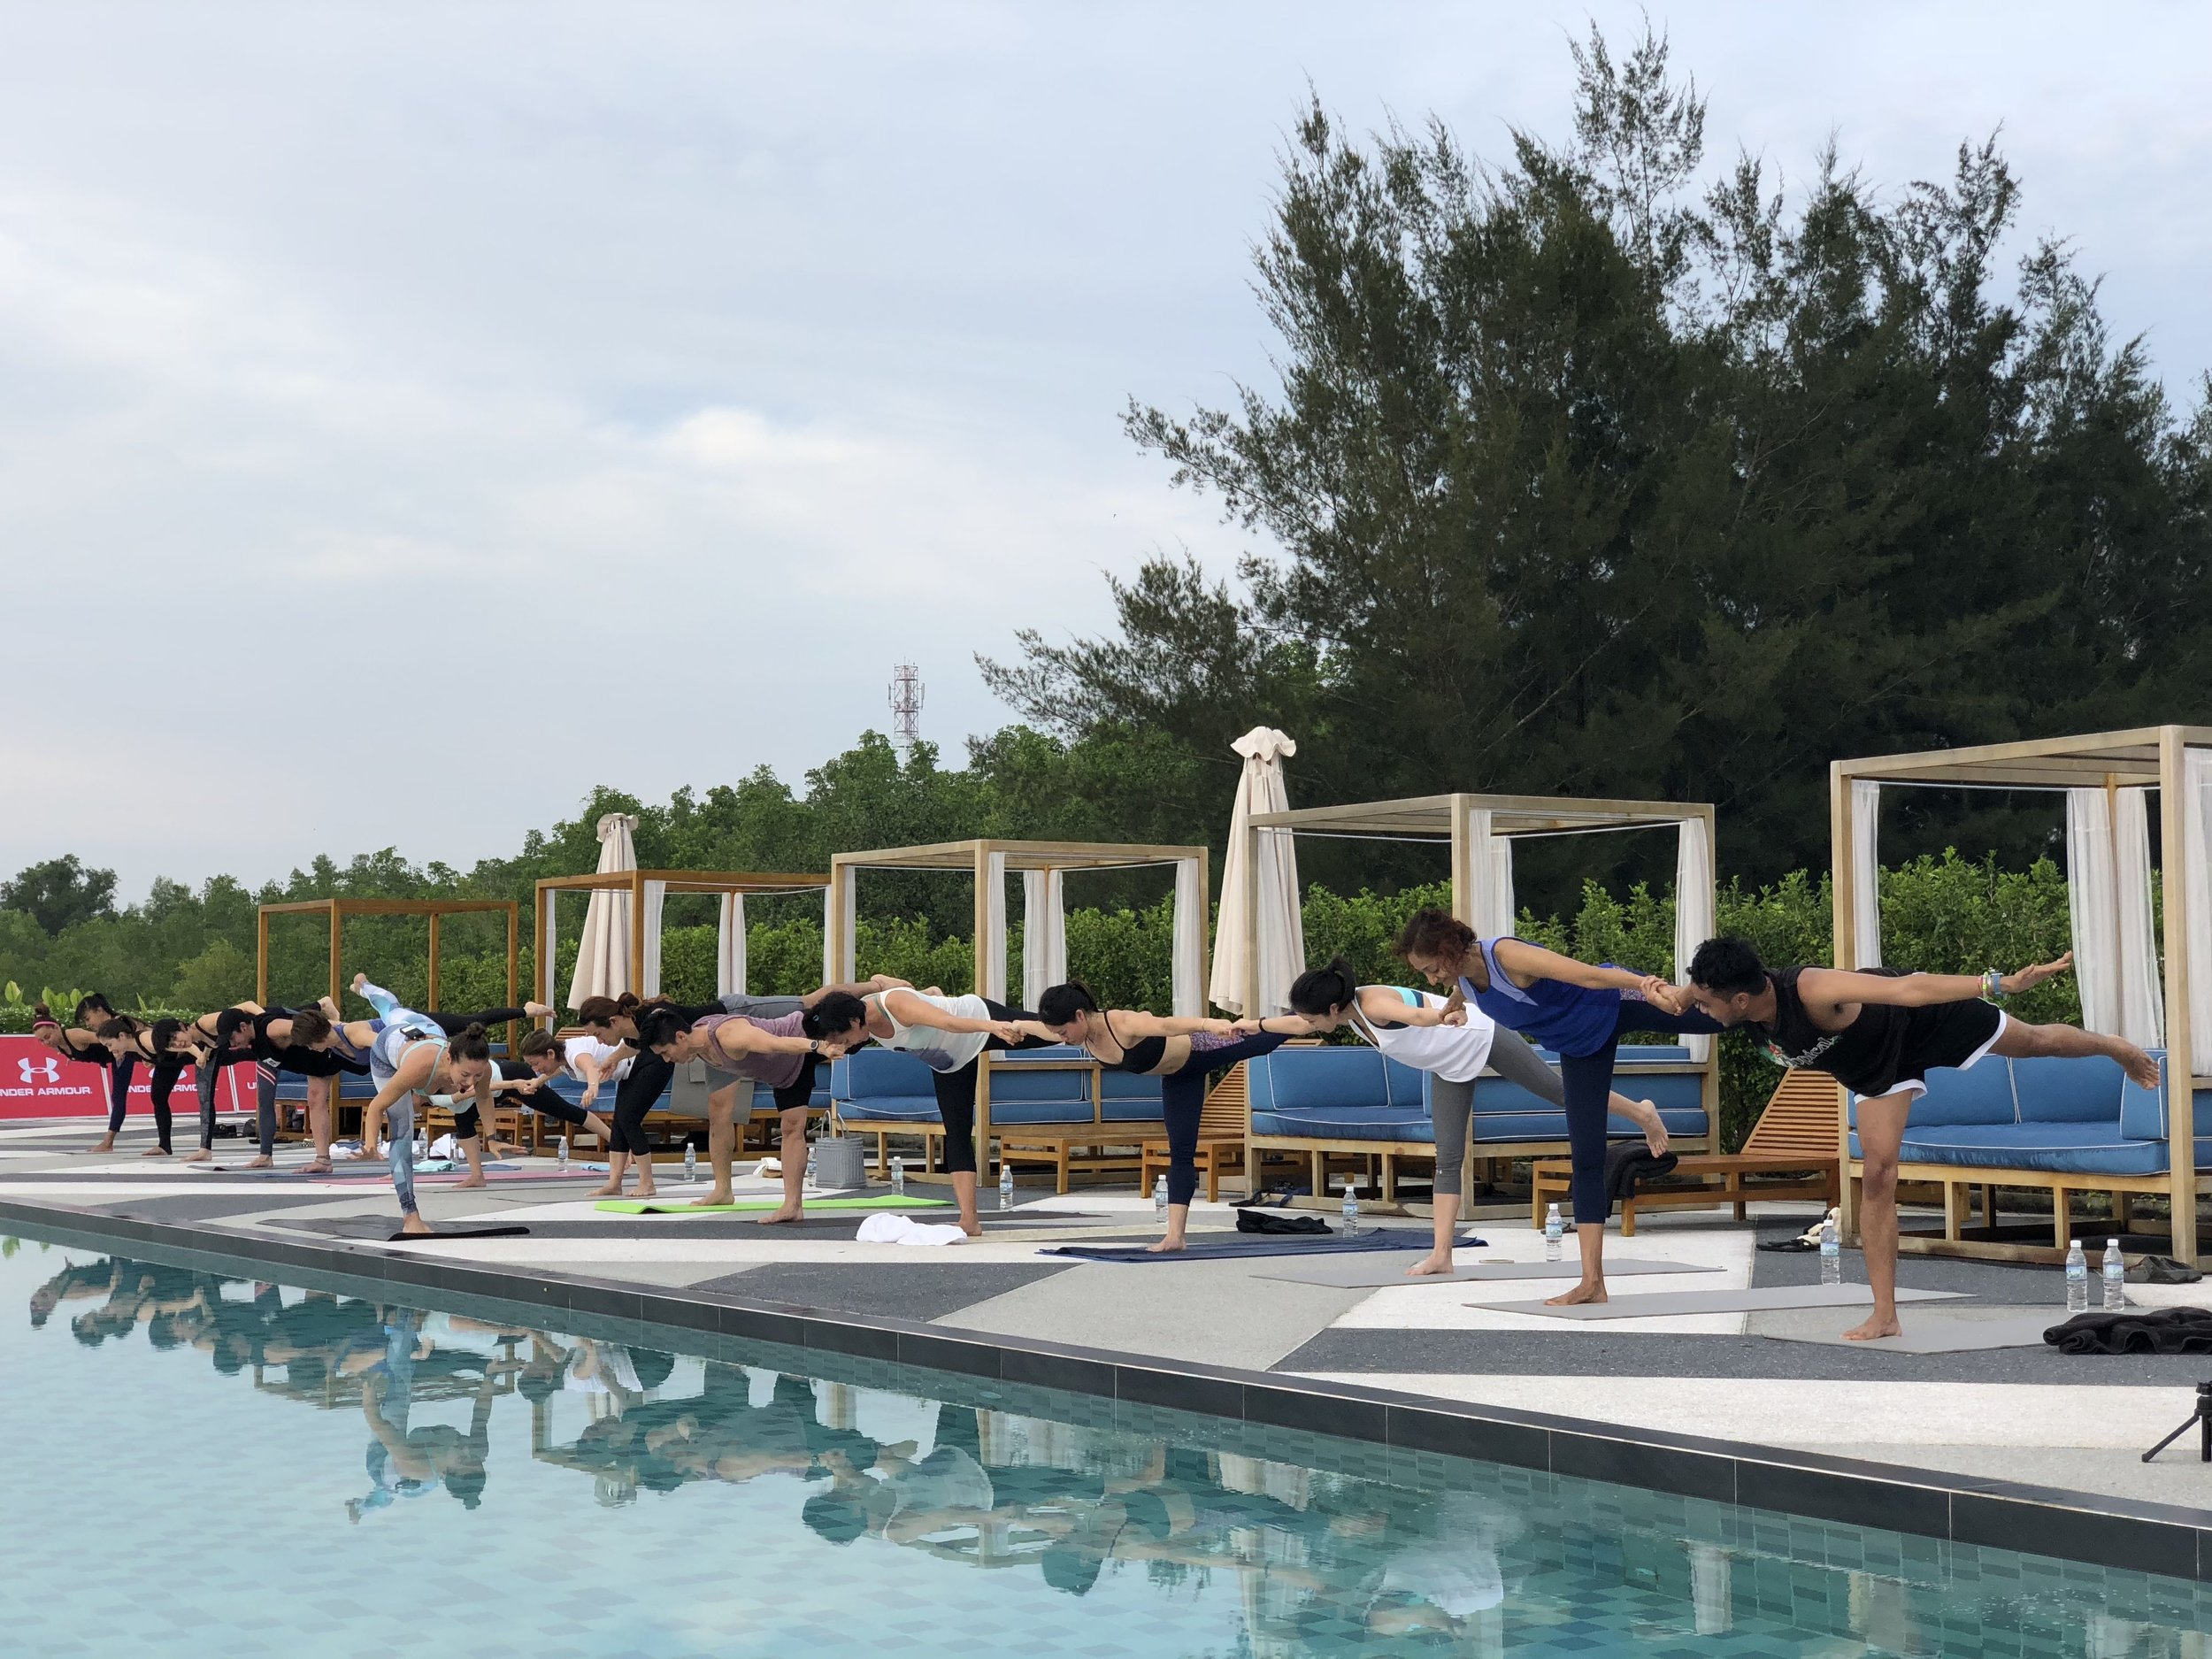 Denise Keller encouraging yogis to hold hands and keep the peace. Photo: Rainforest Fringe Festival